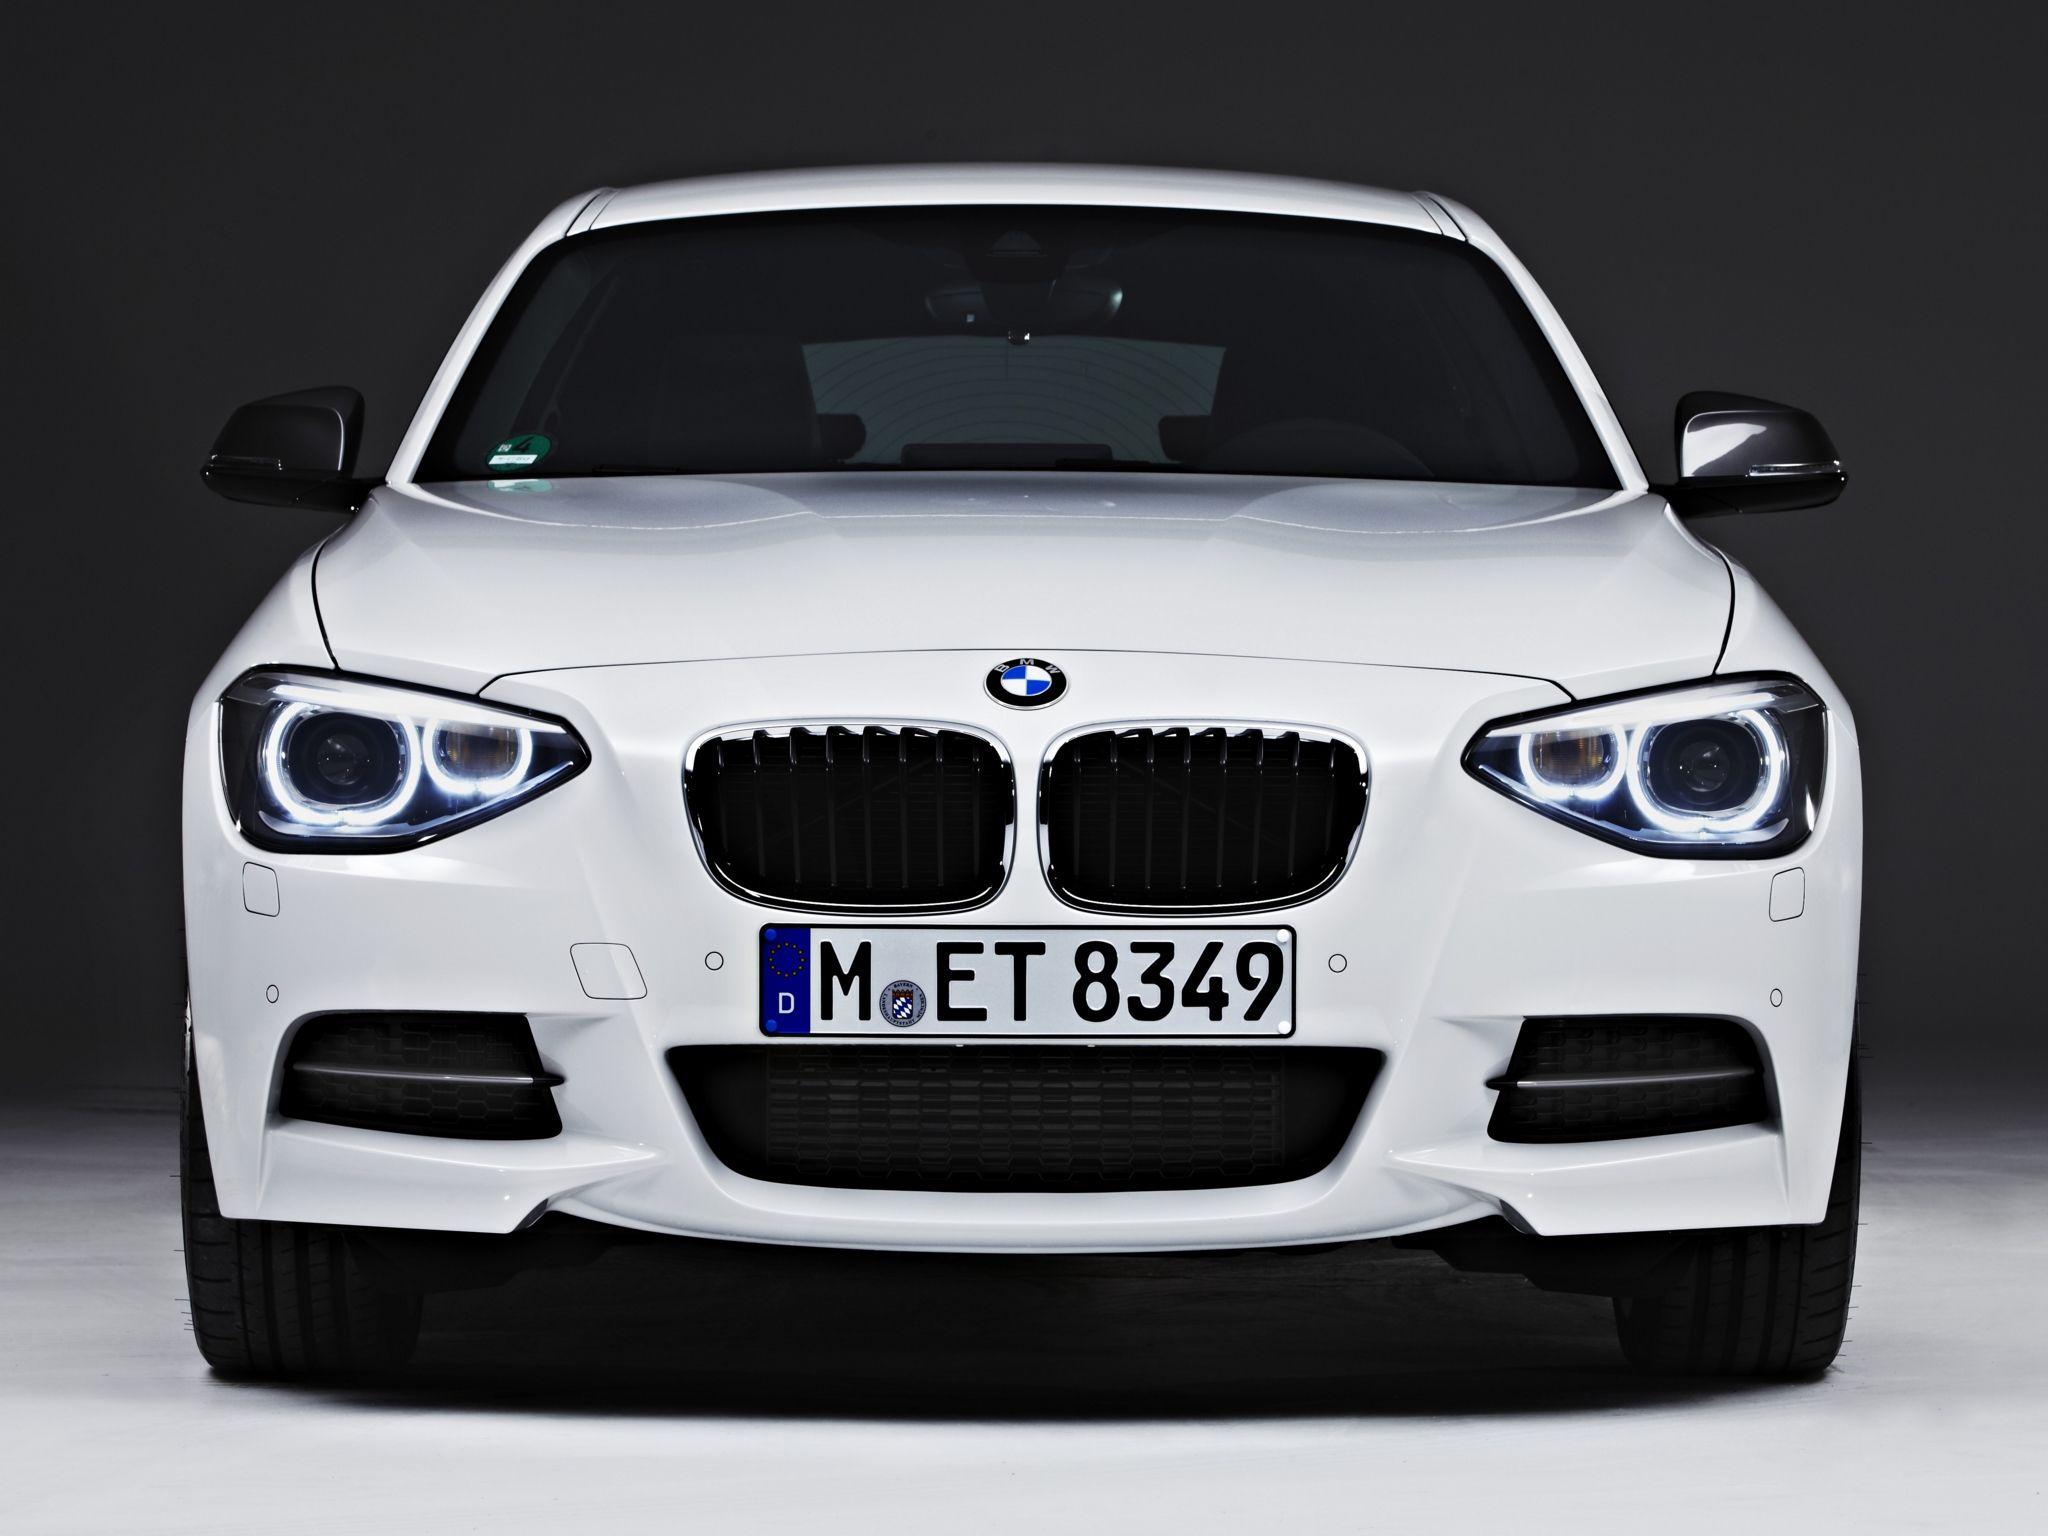 BMW M135i 5-door (F20) 2012 | C_Cars | Front view | 1.4k pins ...